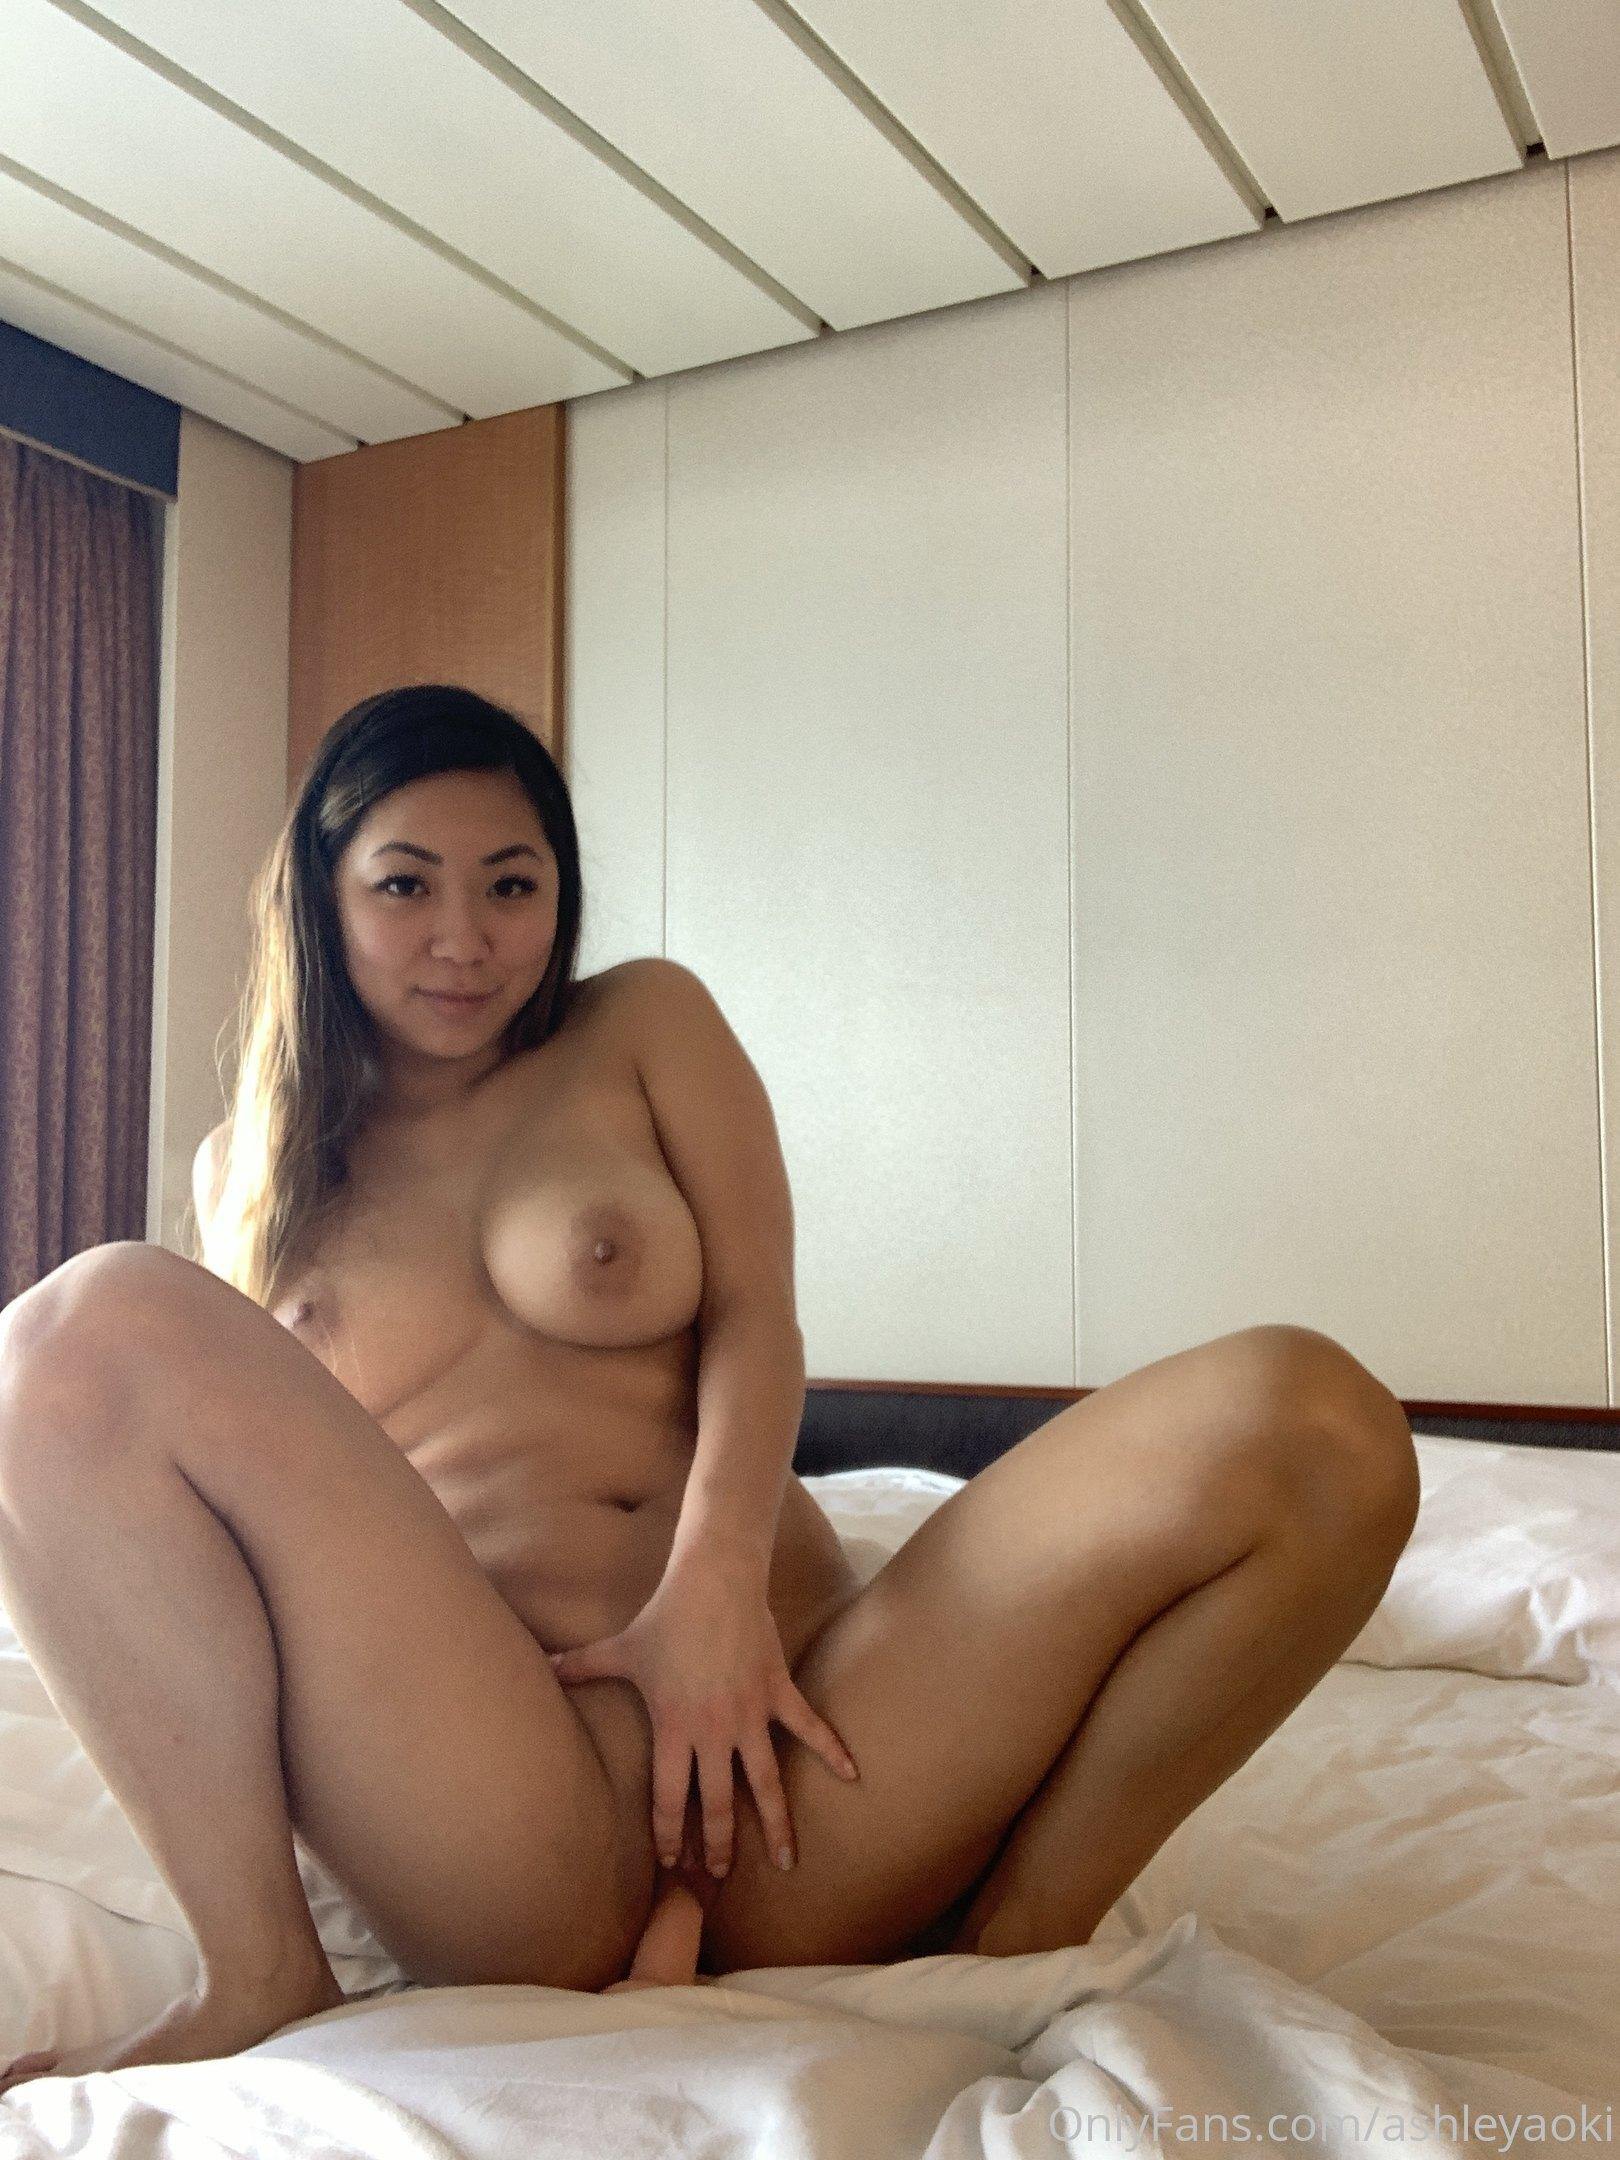 Ashley Aoki, Ashleyaoki, Onlyfans Leaks 0187